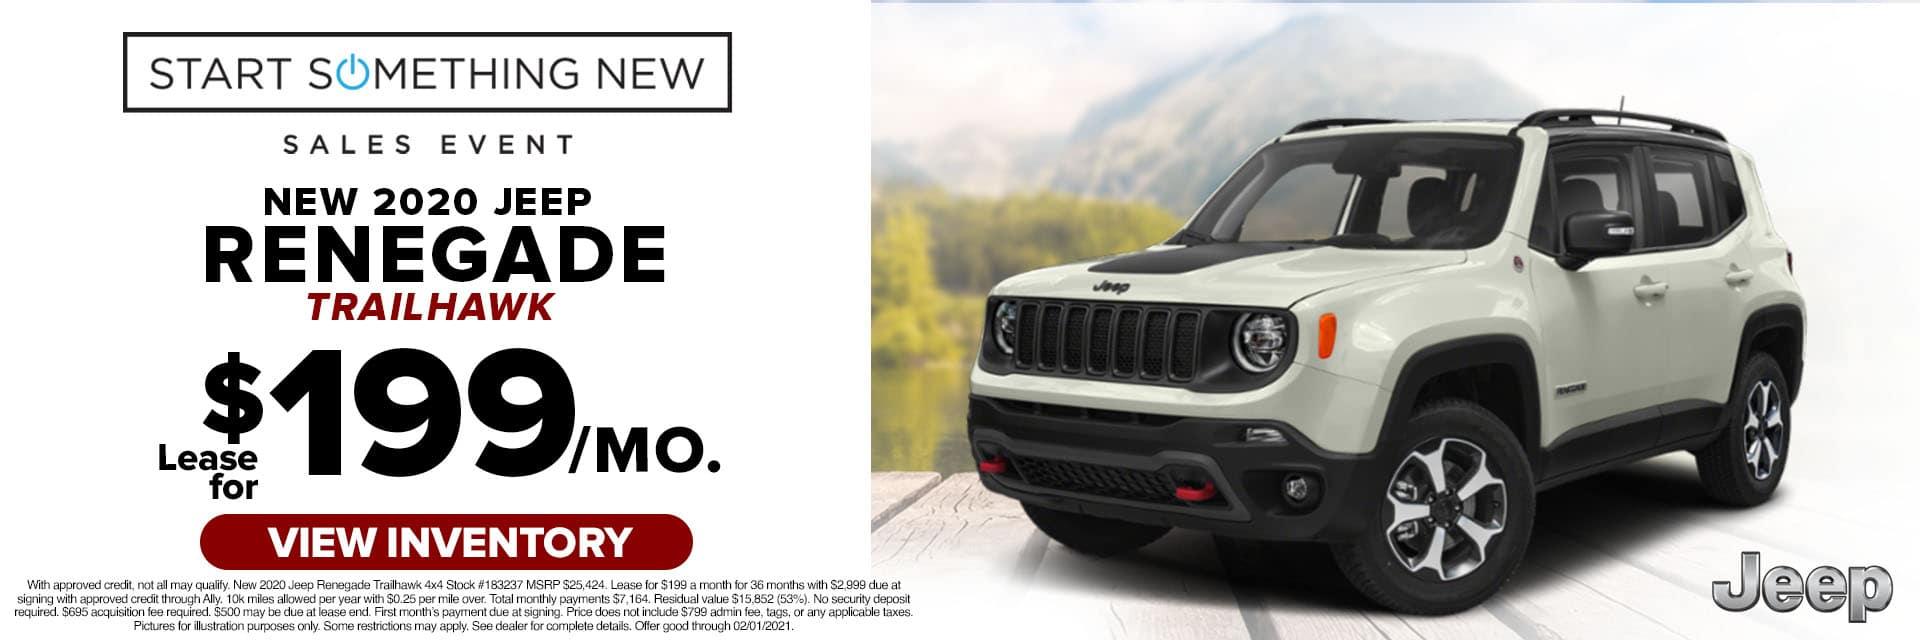 CLCP-January 2021-2020 Jeep Renegade